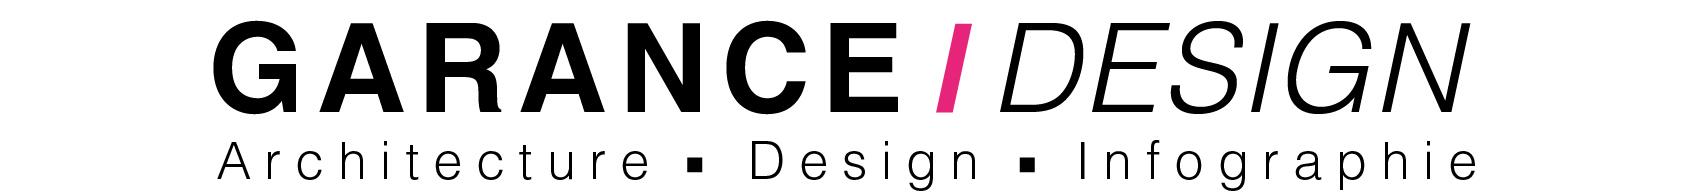 Garance Design